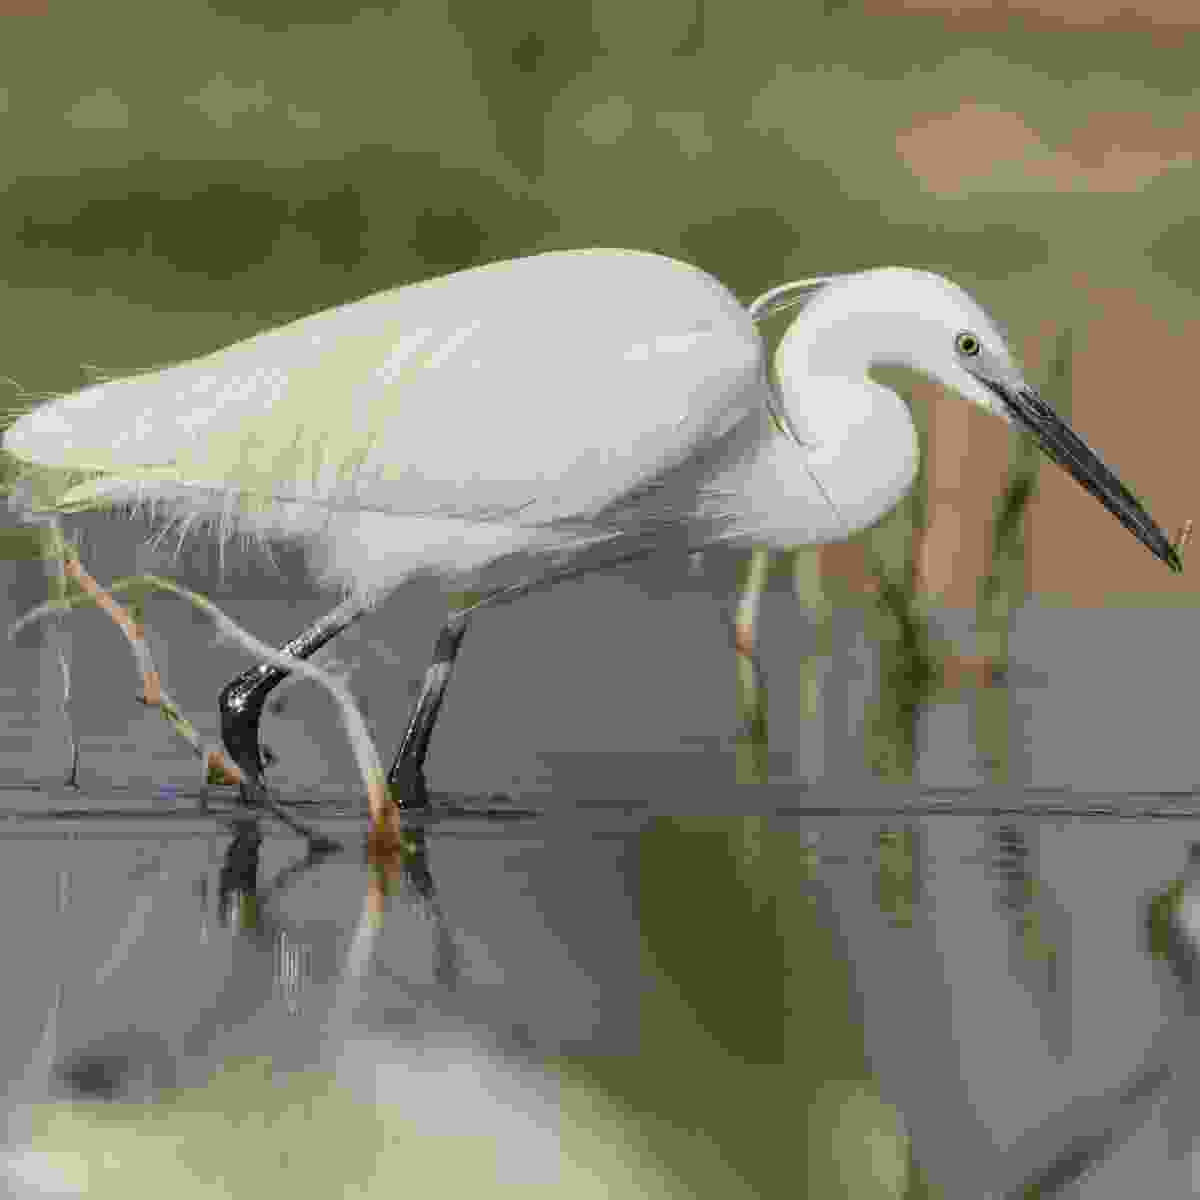 Spot little egrets alongside the White Nile at Jinja, Uganda (Dreamstime)